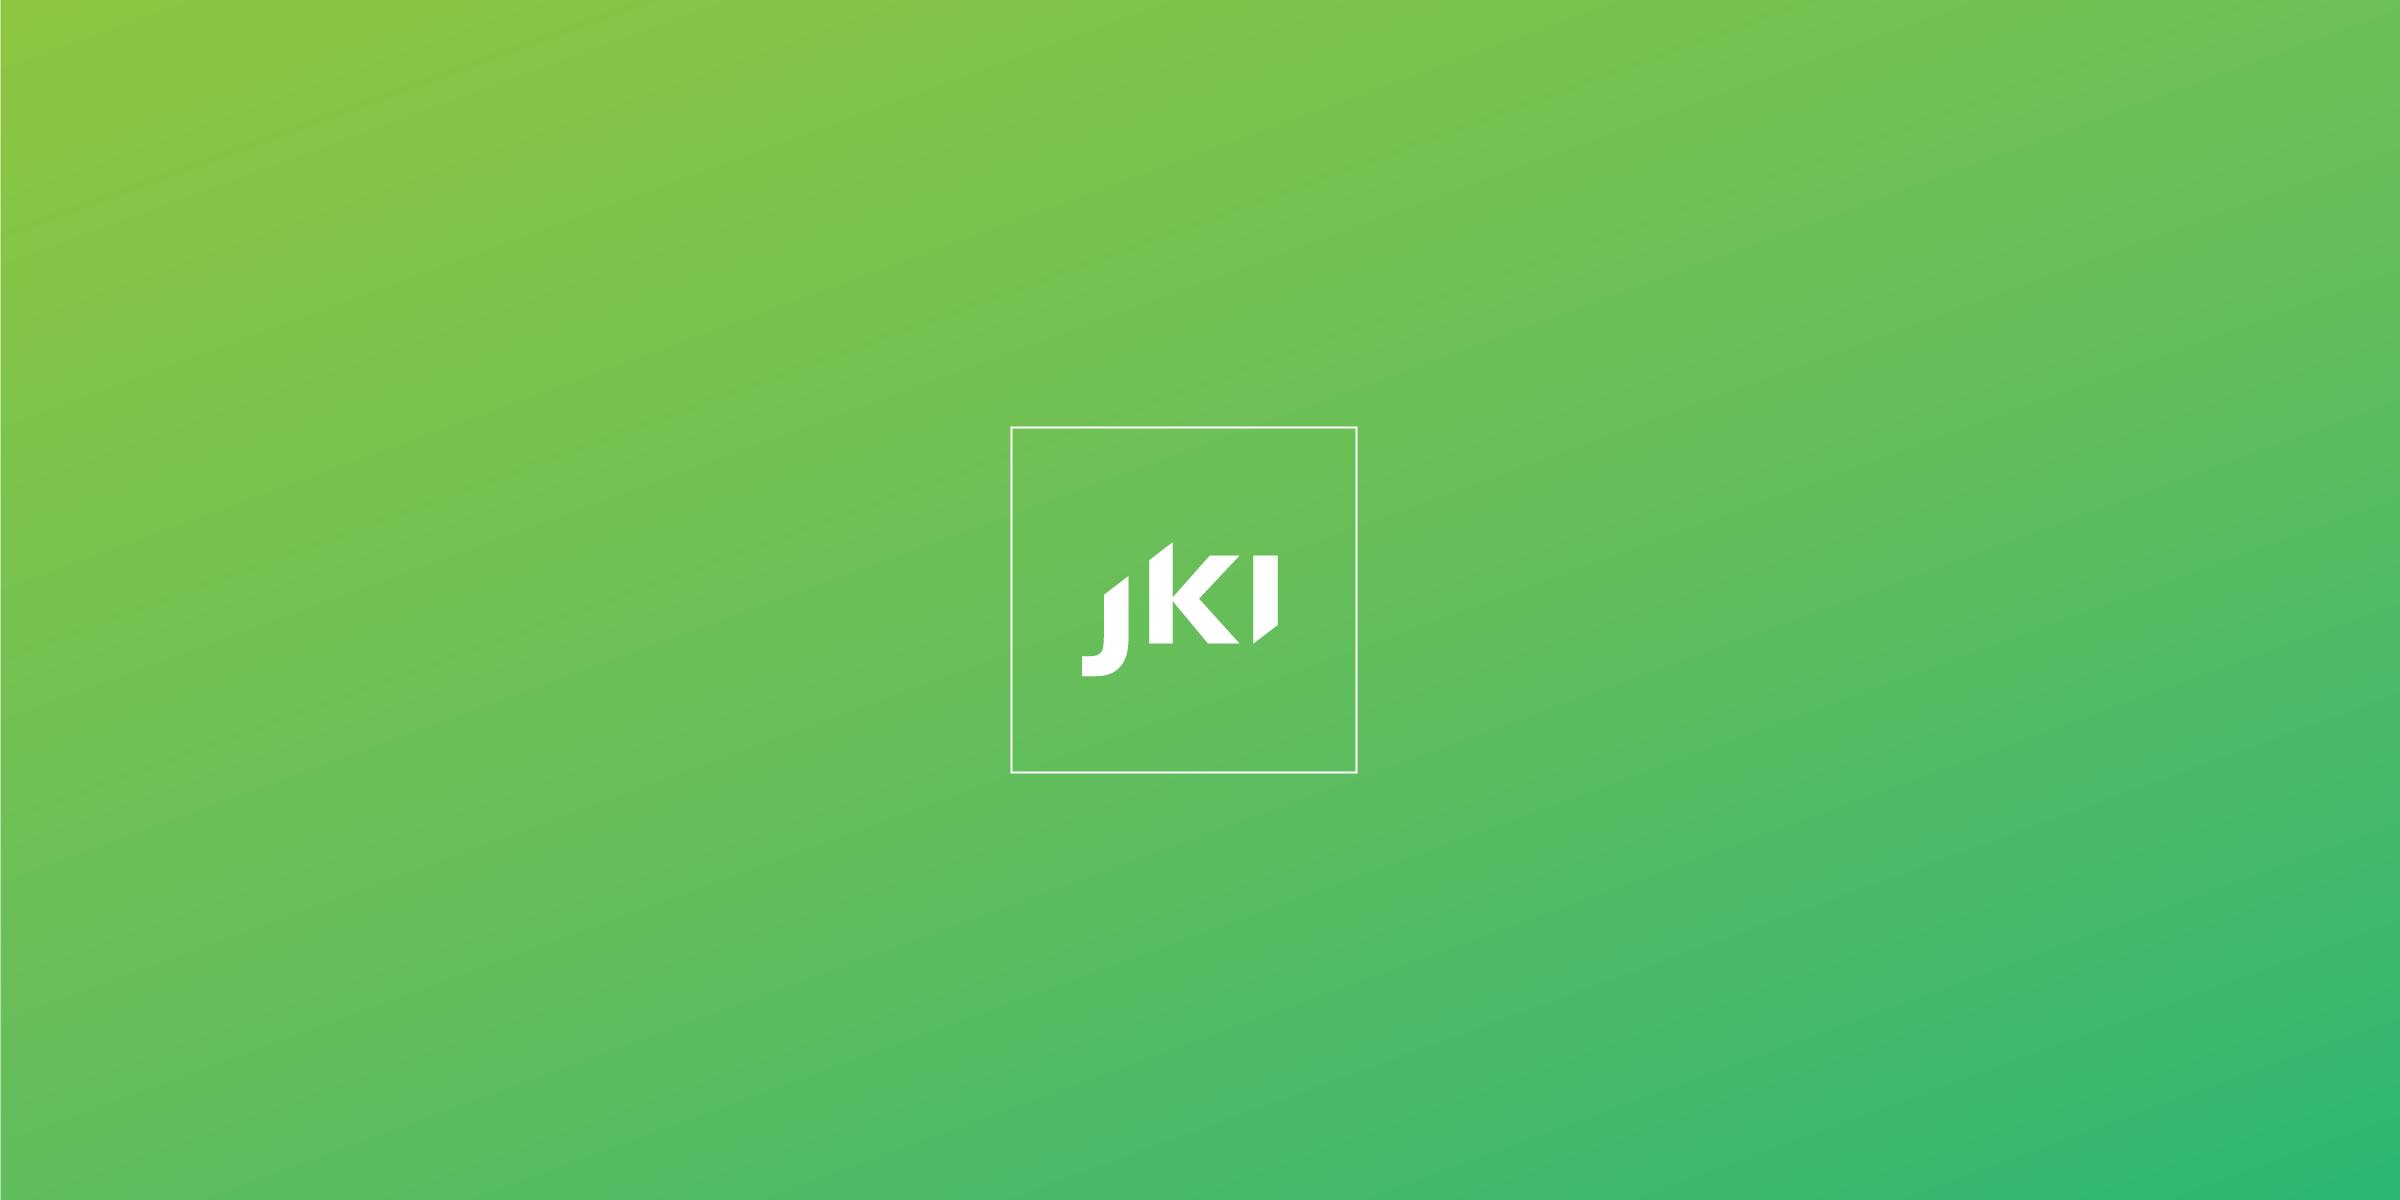 jki-gradient-banner.png